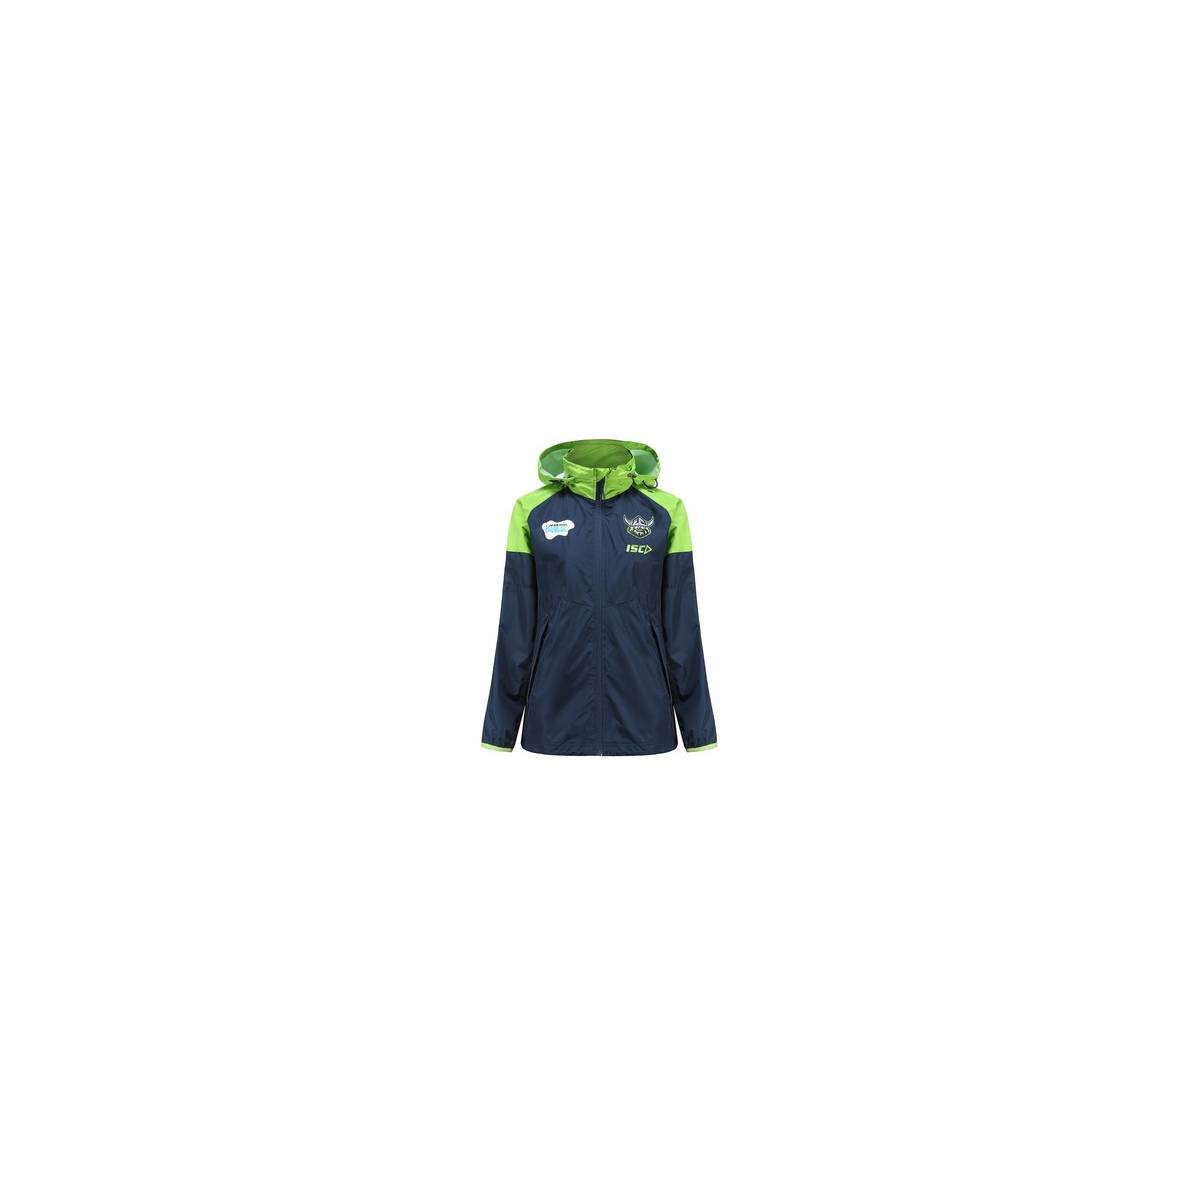 2021 Ladies Wet Weather Jacket4